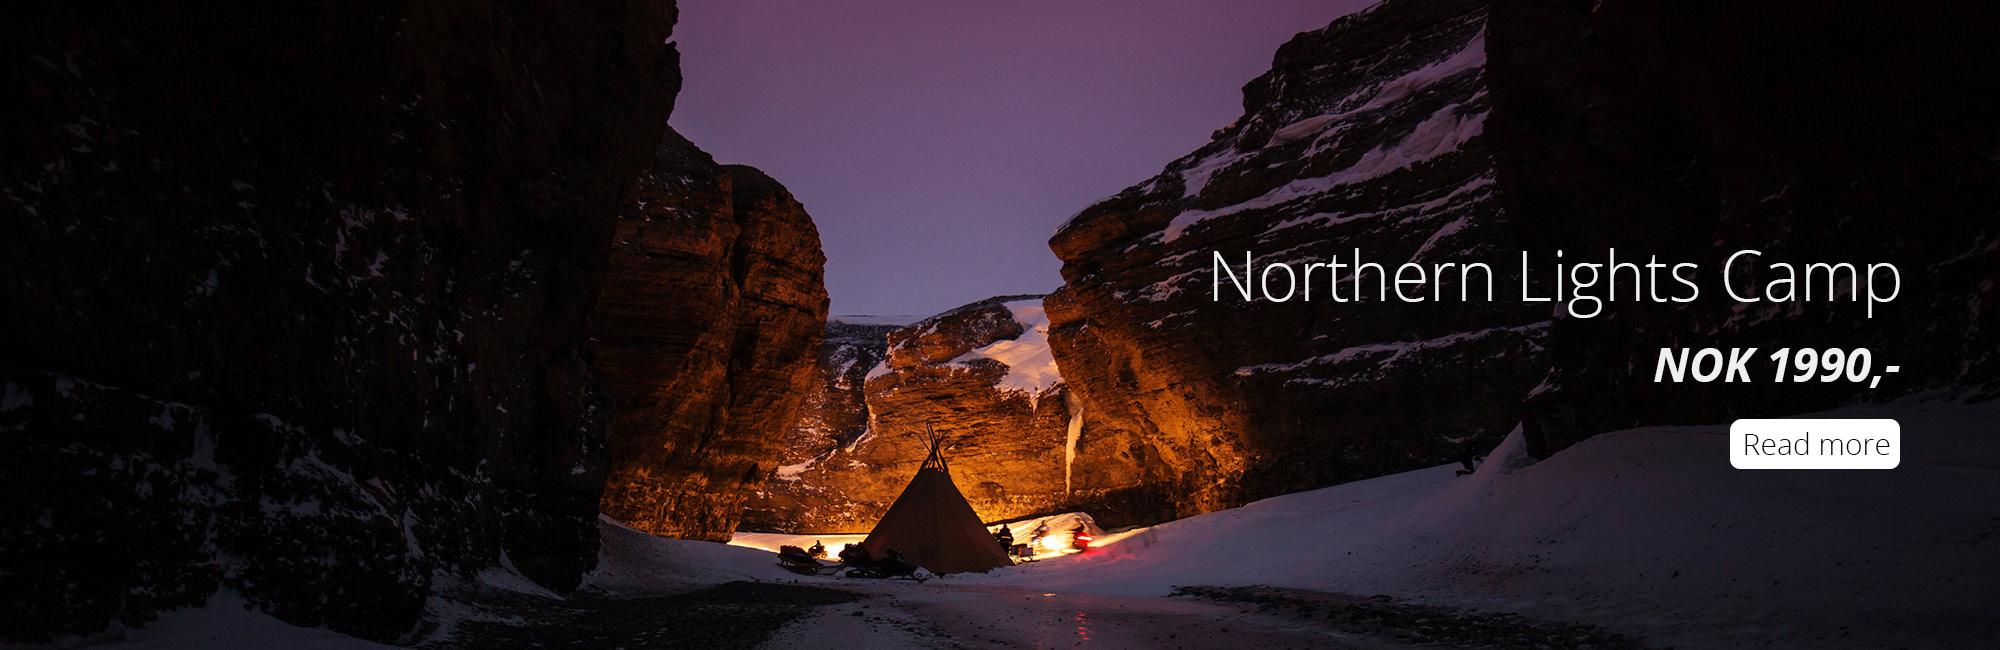 Northern Lights Camp